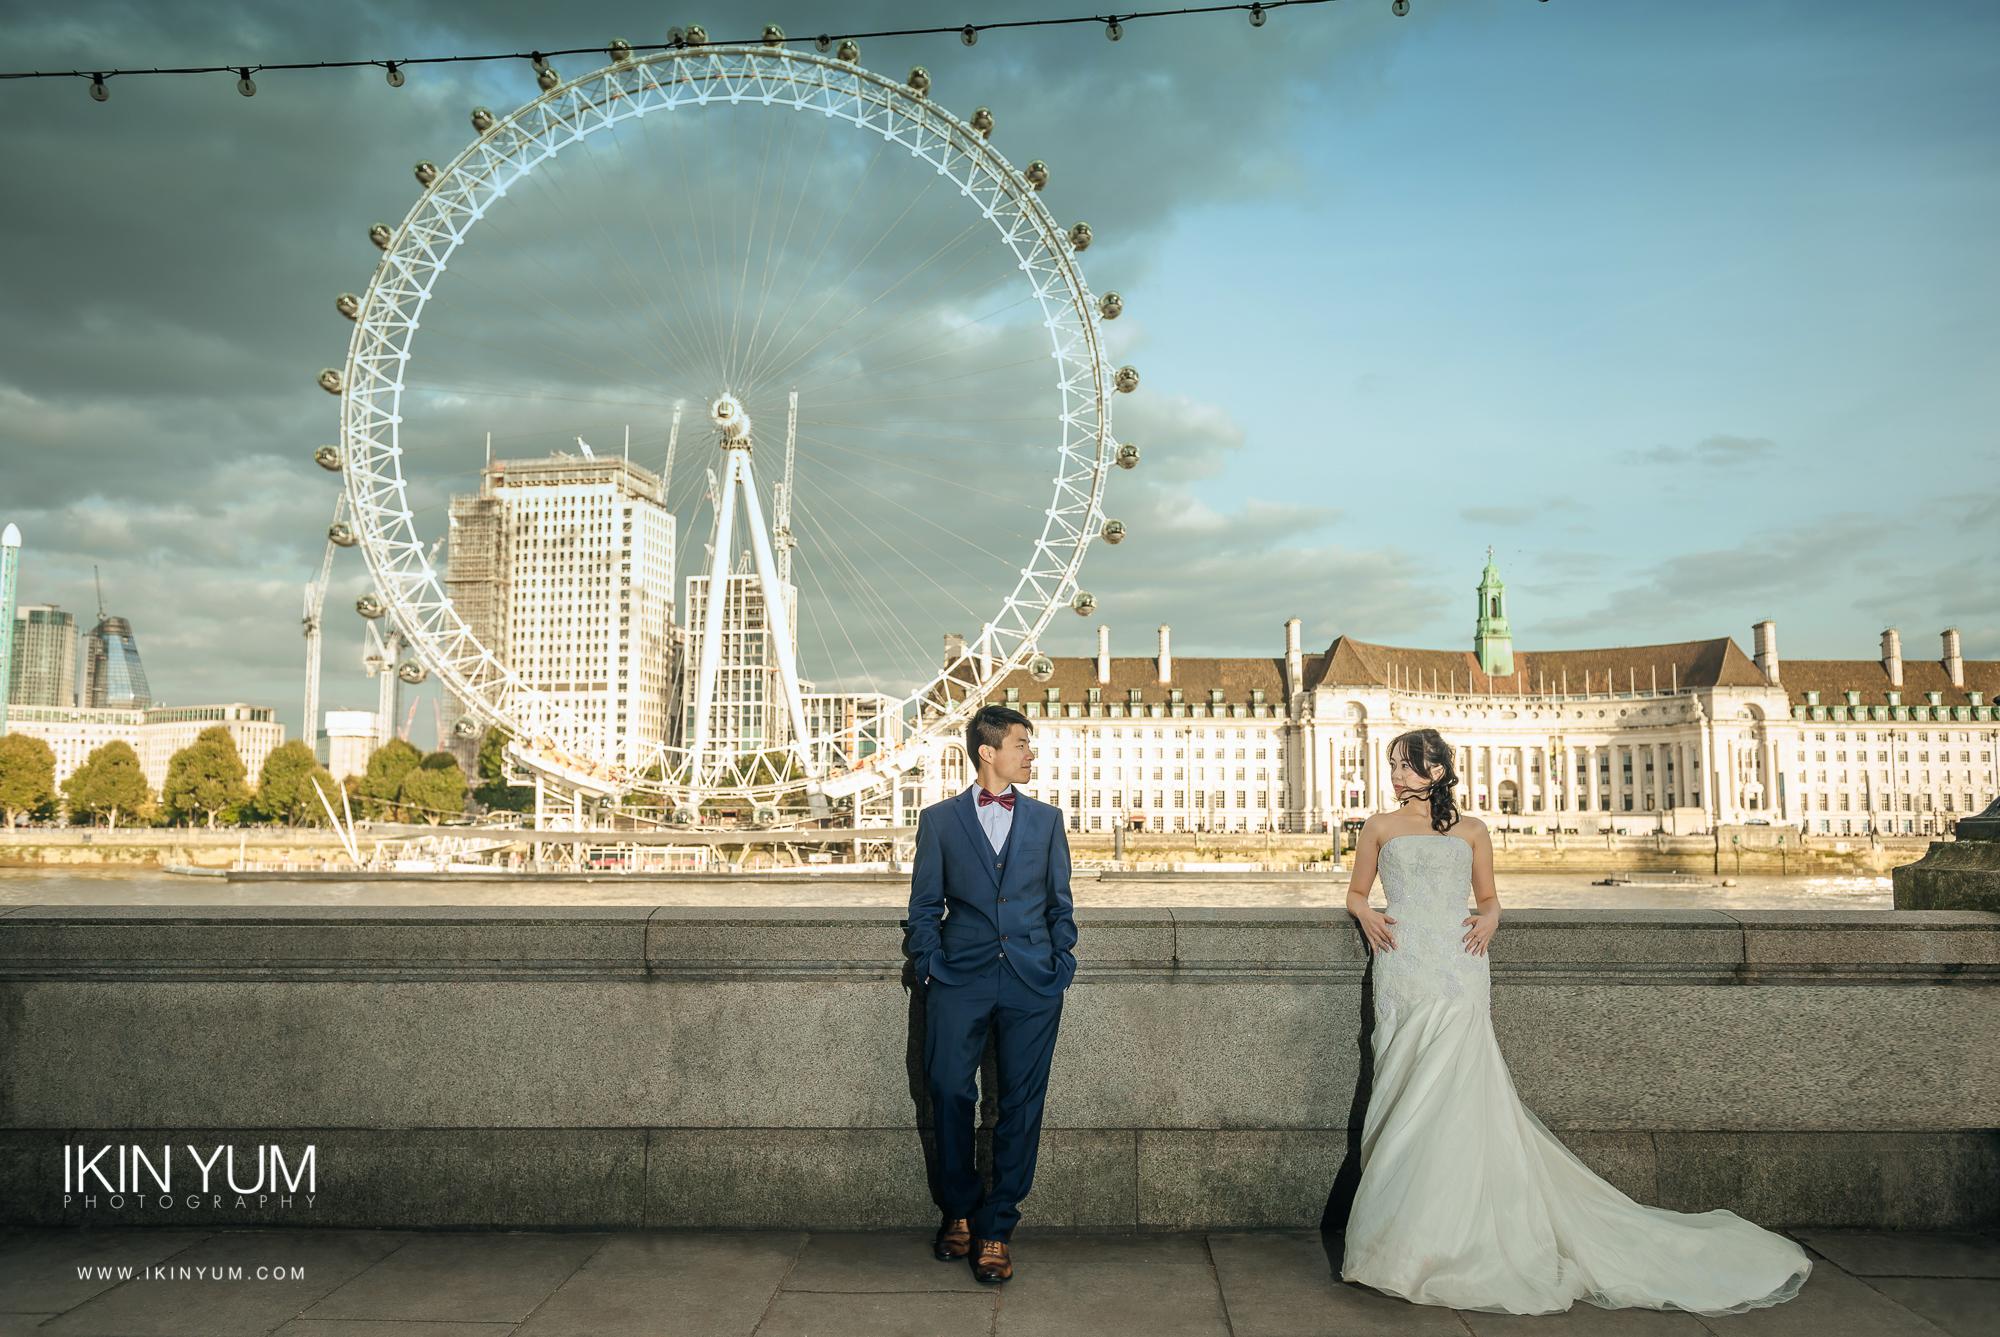 Chloe & Carlos Pre-Wedding Shoot- Ikin Yum Photography-0098.jpg